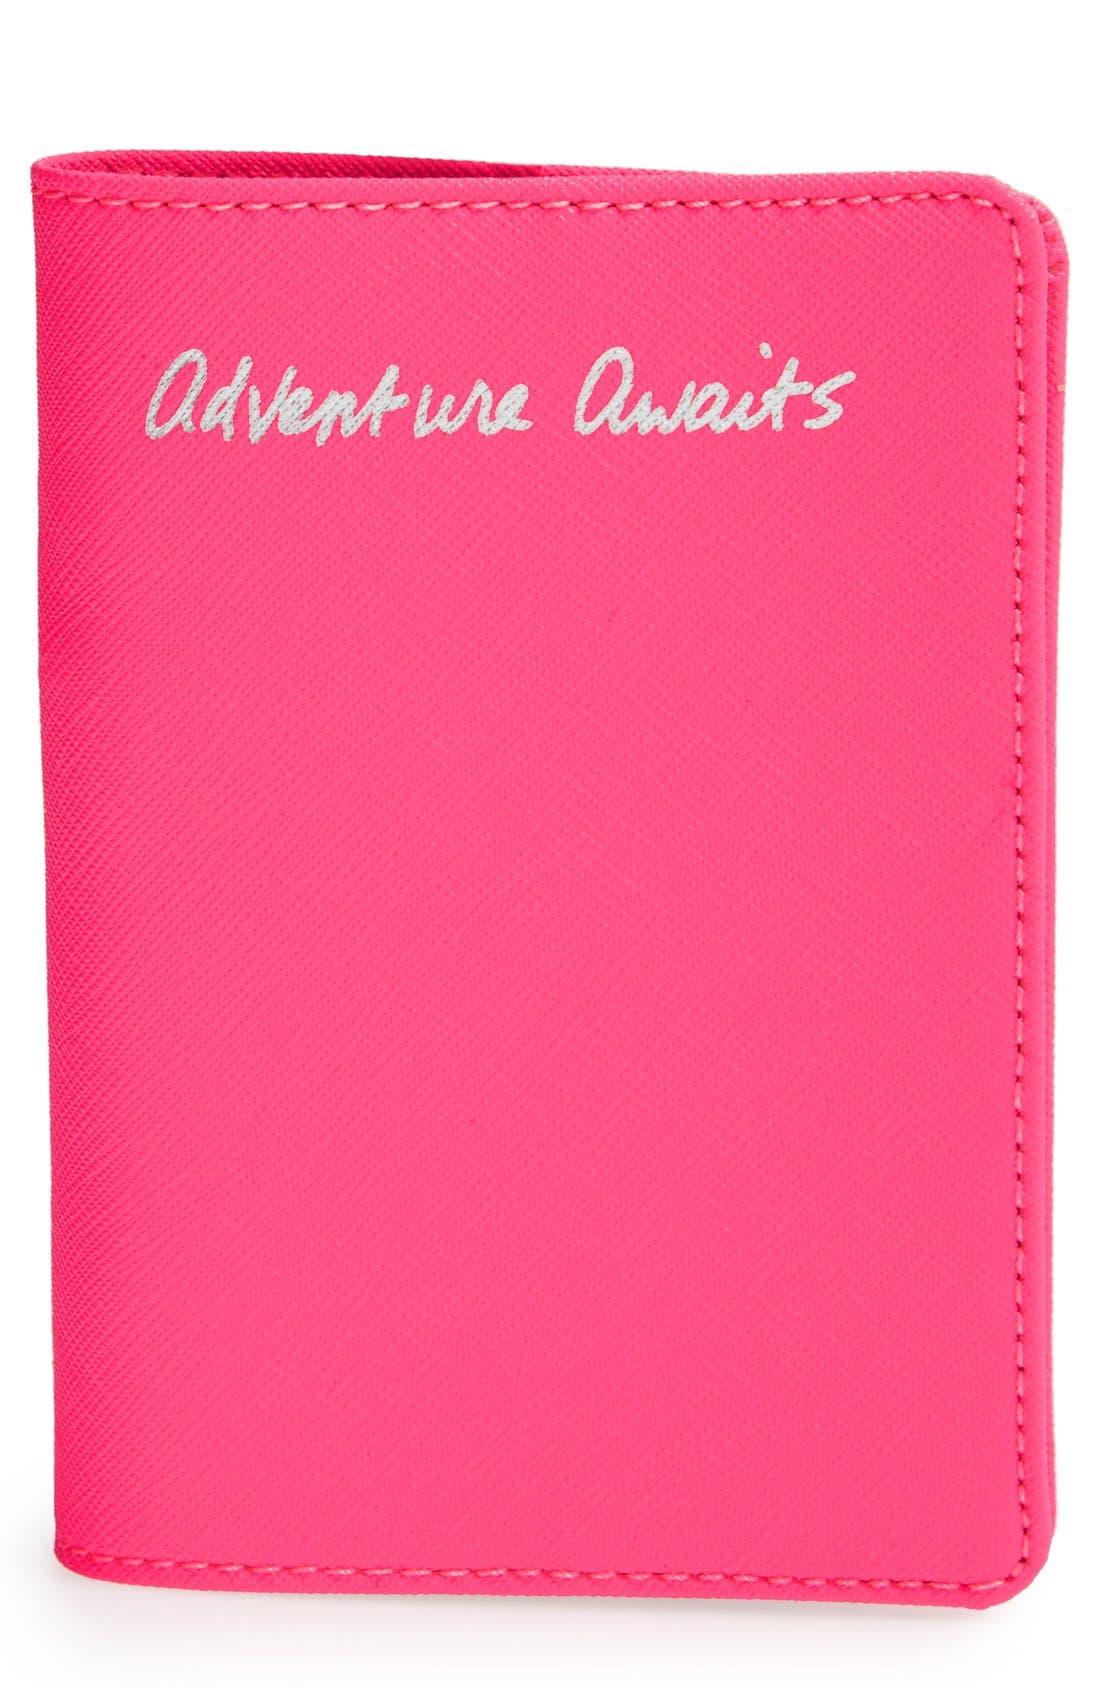 Main Image - Rebecca Minkoff 'Adventure Awaits' Passport Holder